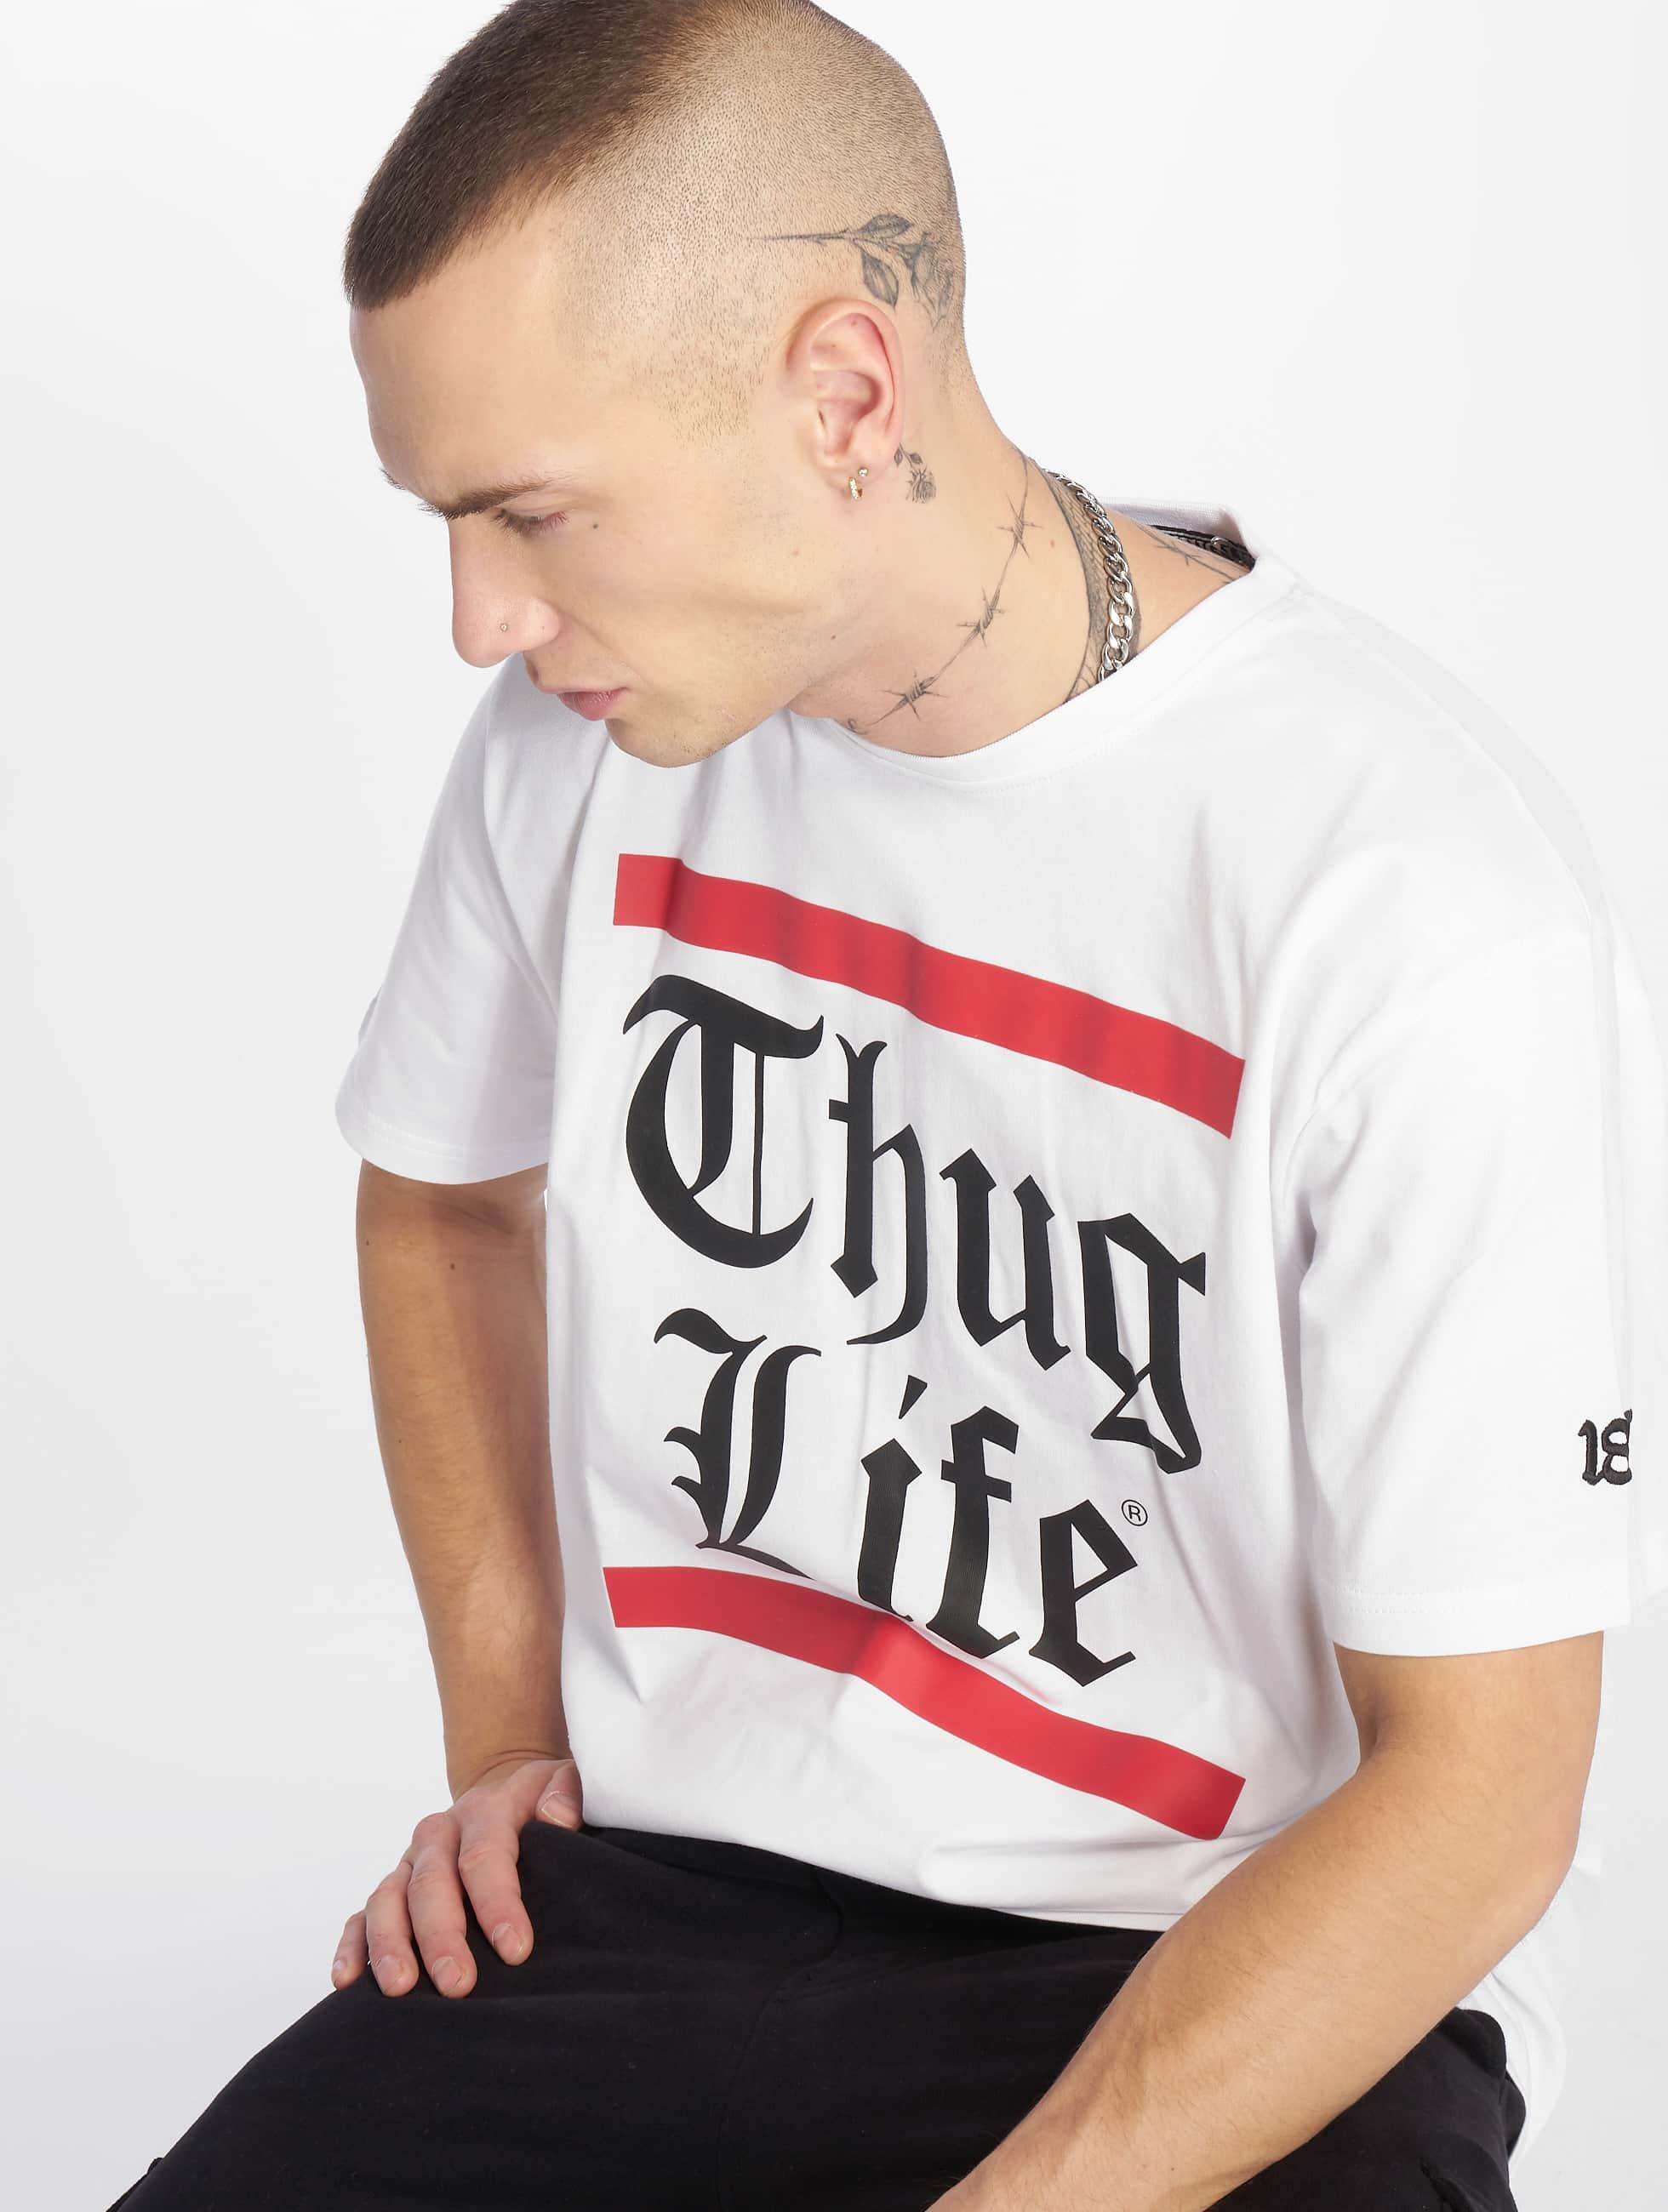 Thug Life / T-Shirt B.Gothic in white 2XL